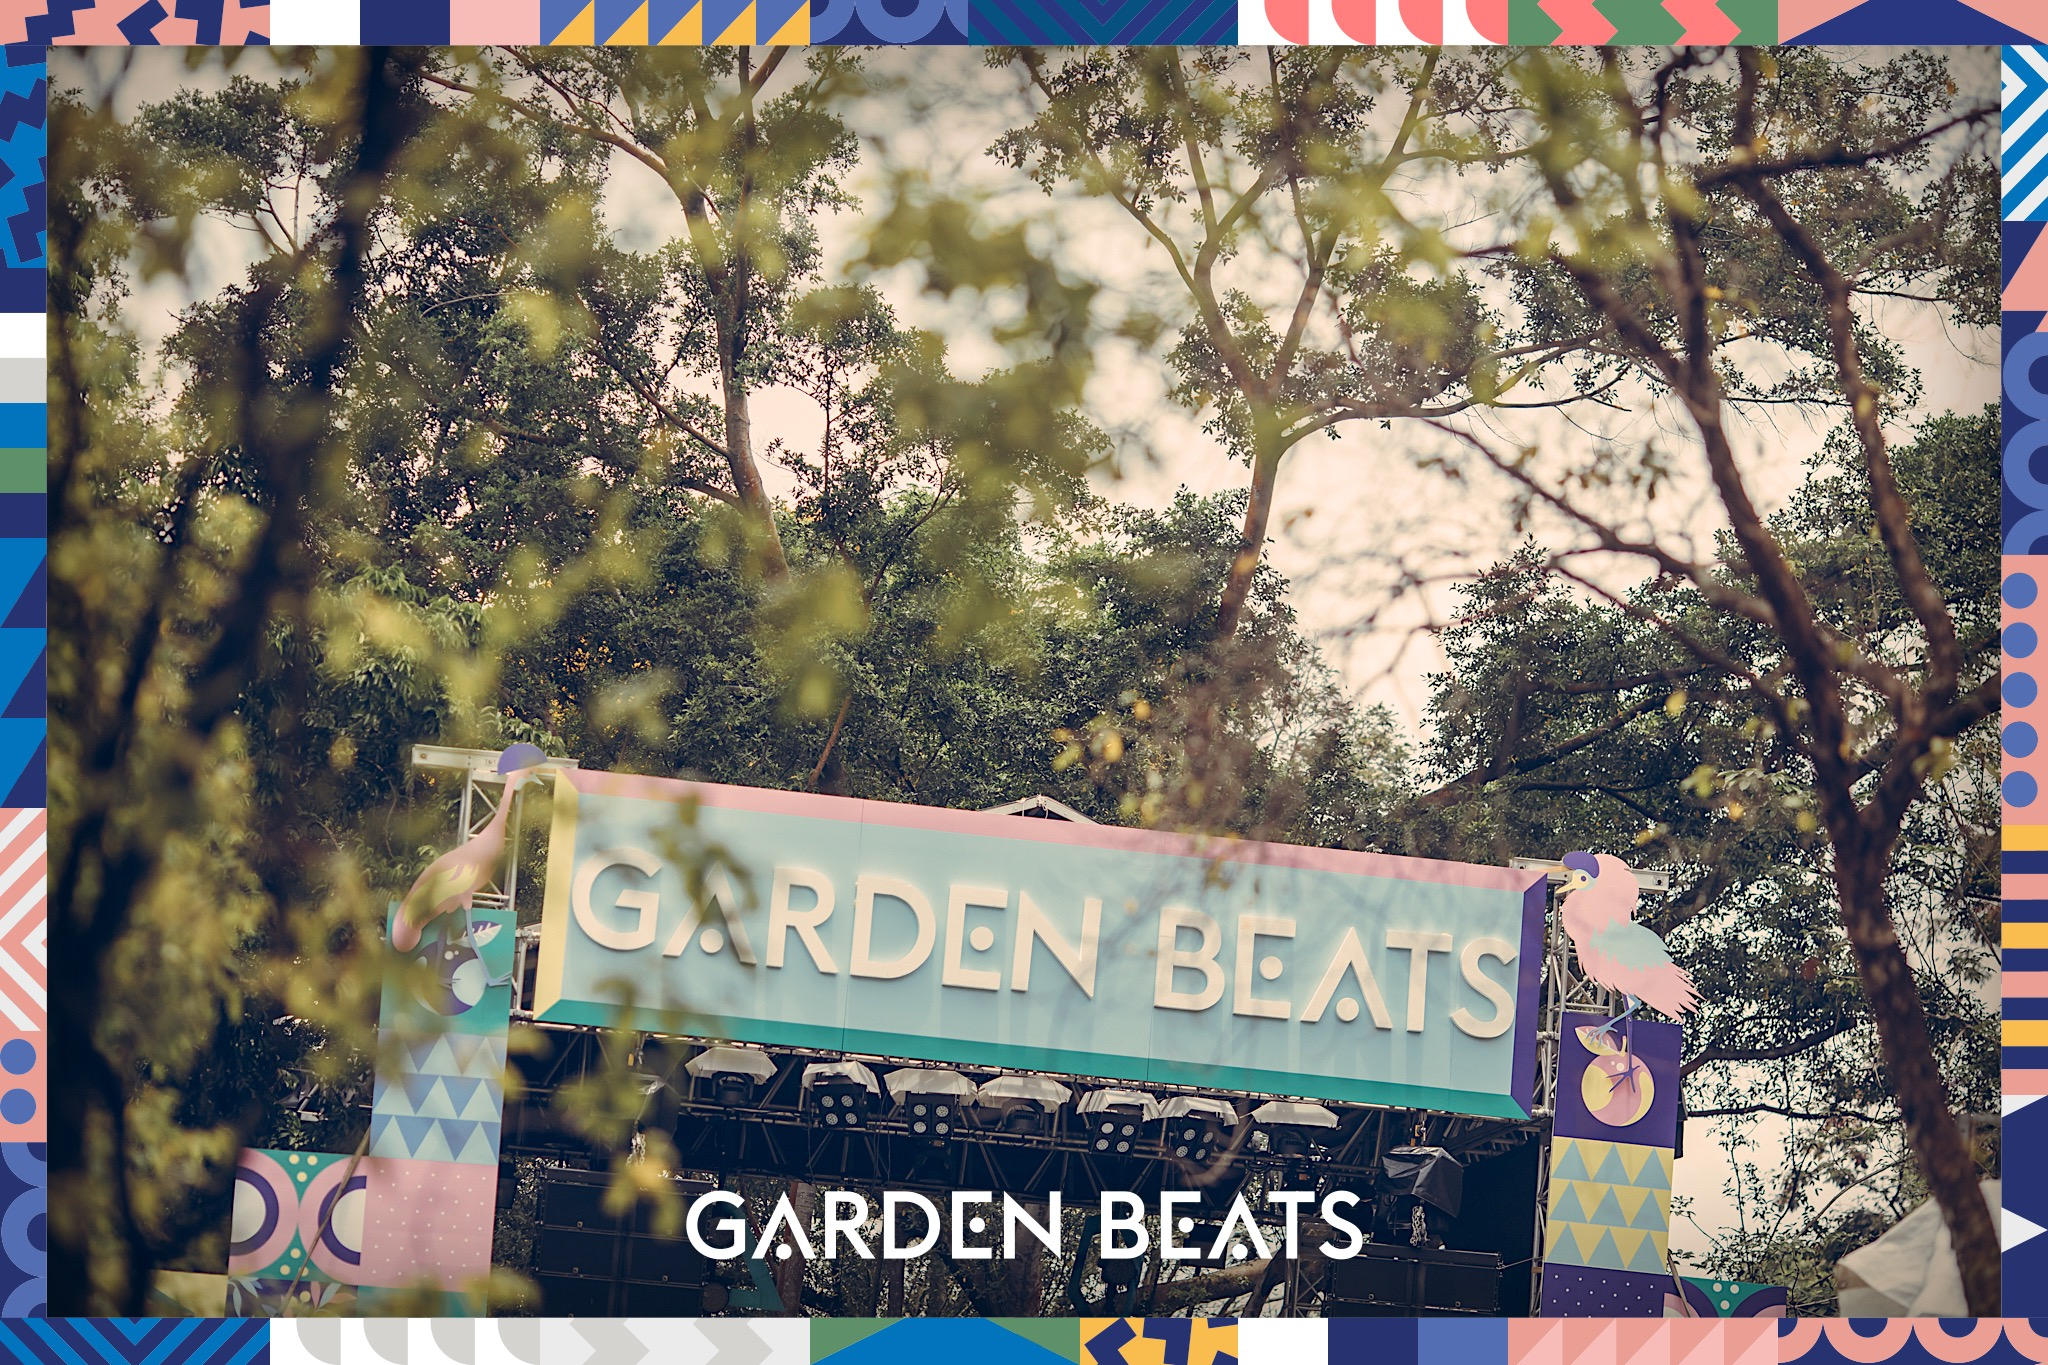 03032018_GardenBeats_Colossal022_Watermarked.jpg